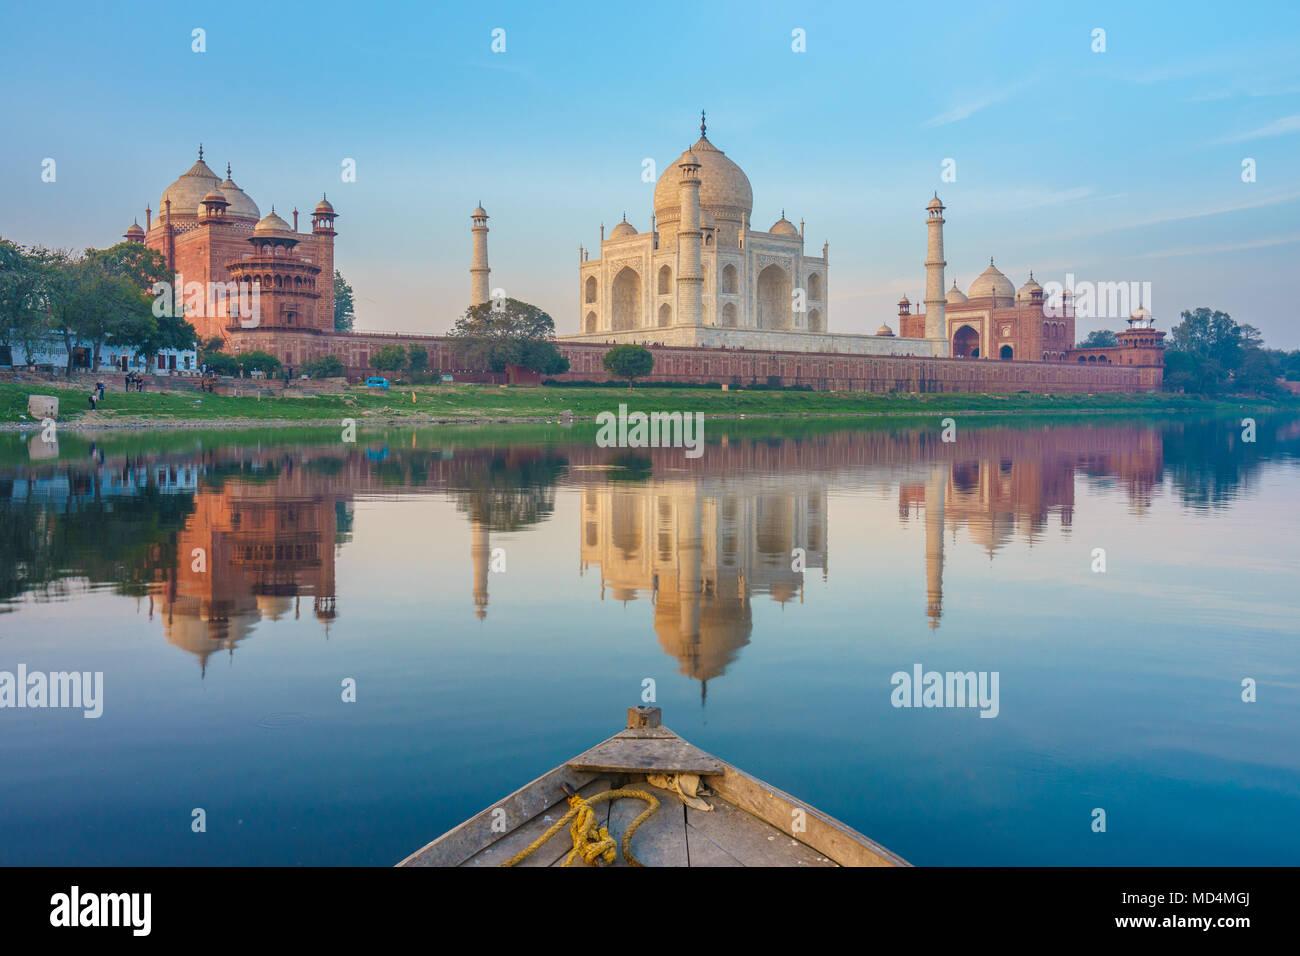 Boat ride on Yamuna river near Taj Mahal - Stock Image